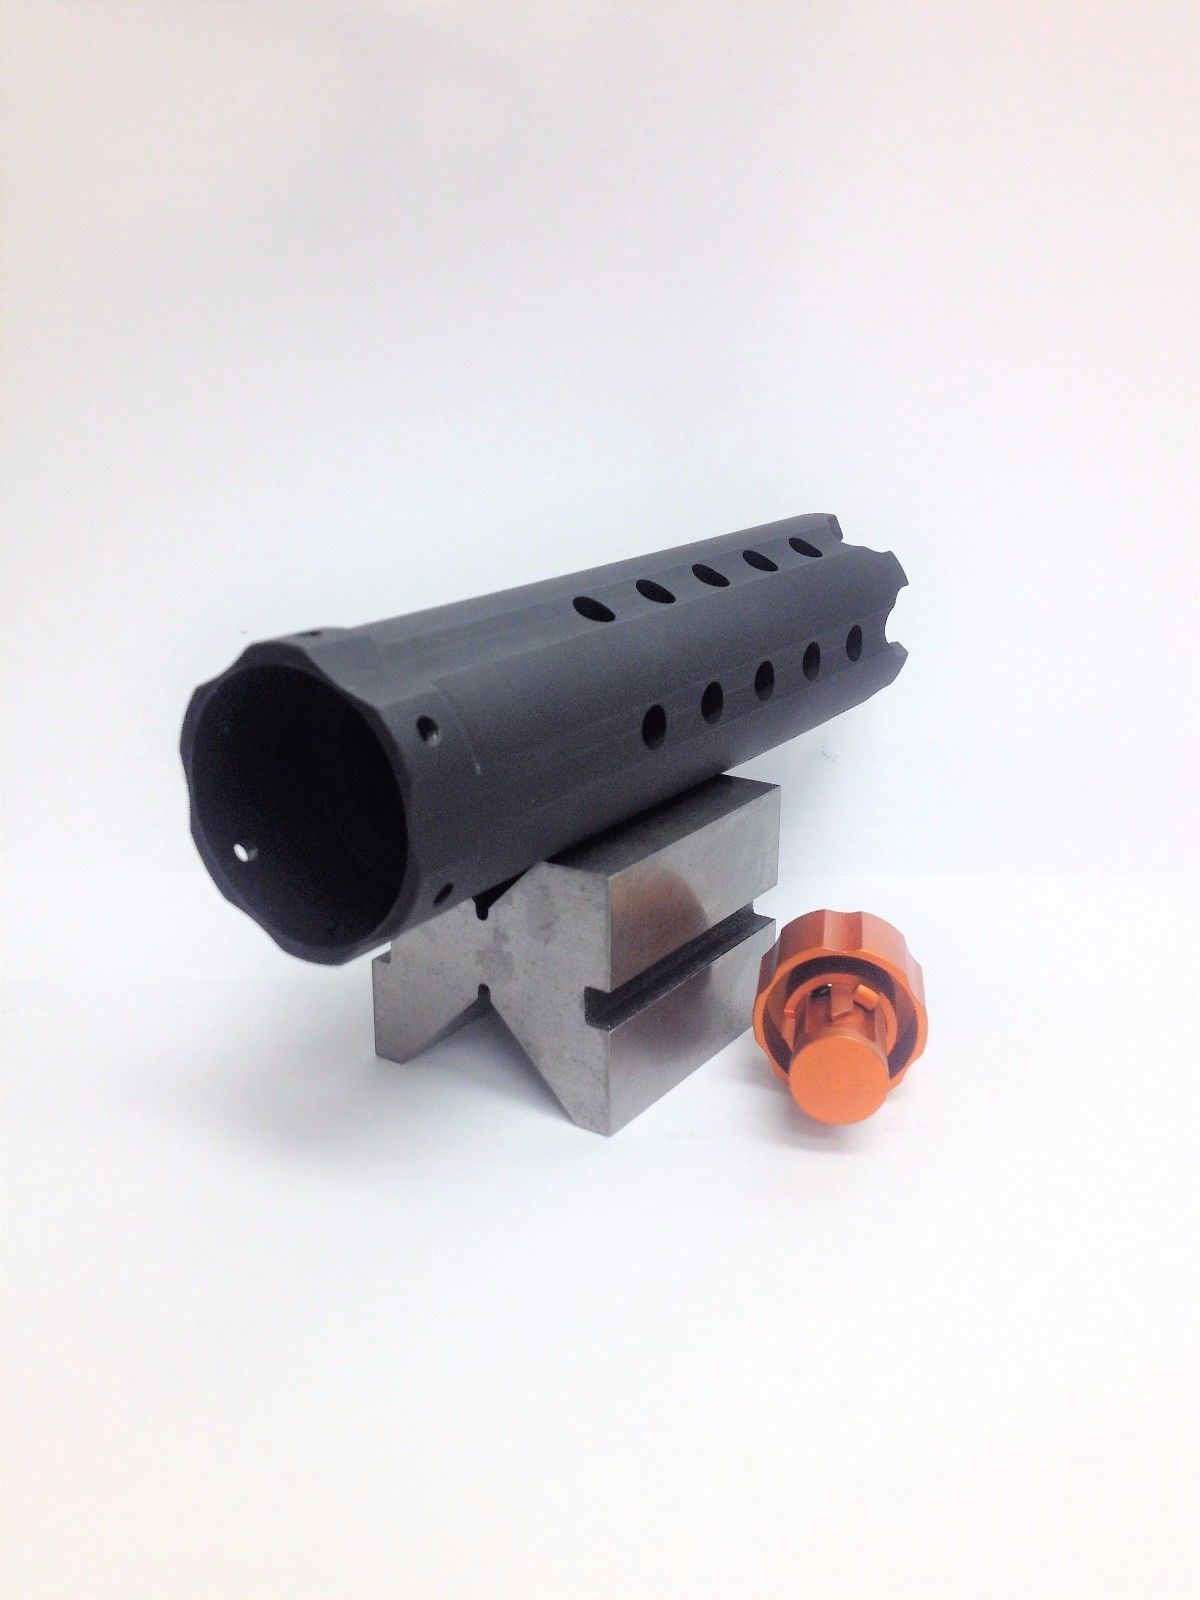 HFD2 Remington TAC-14 Breacher / Standoff and 13 similar items